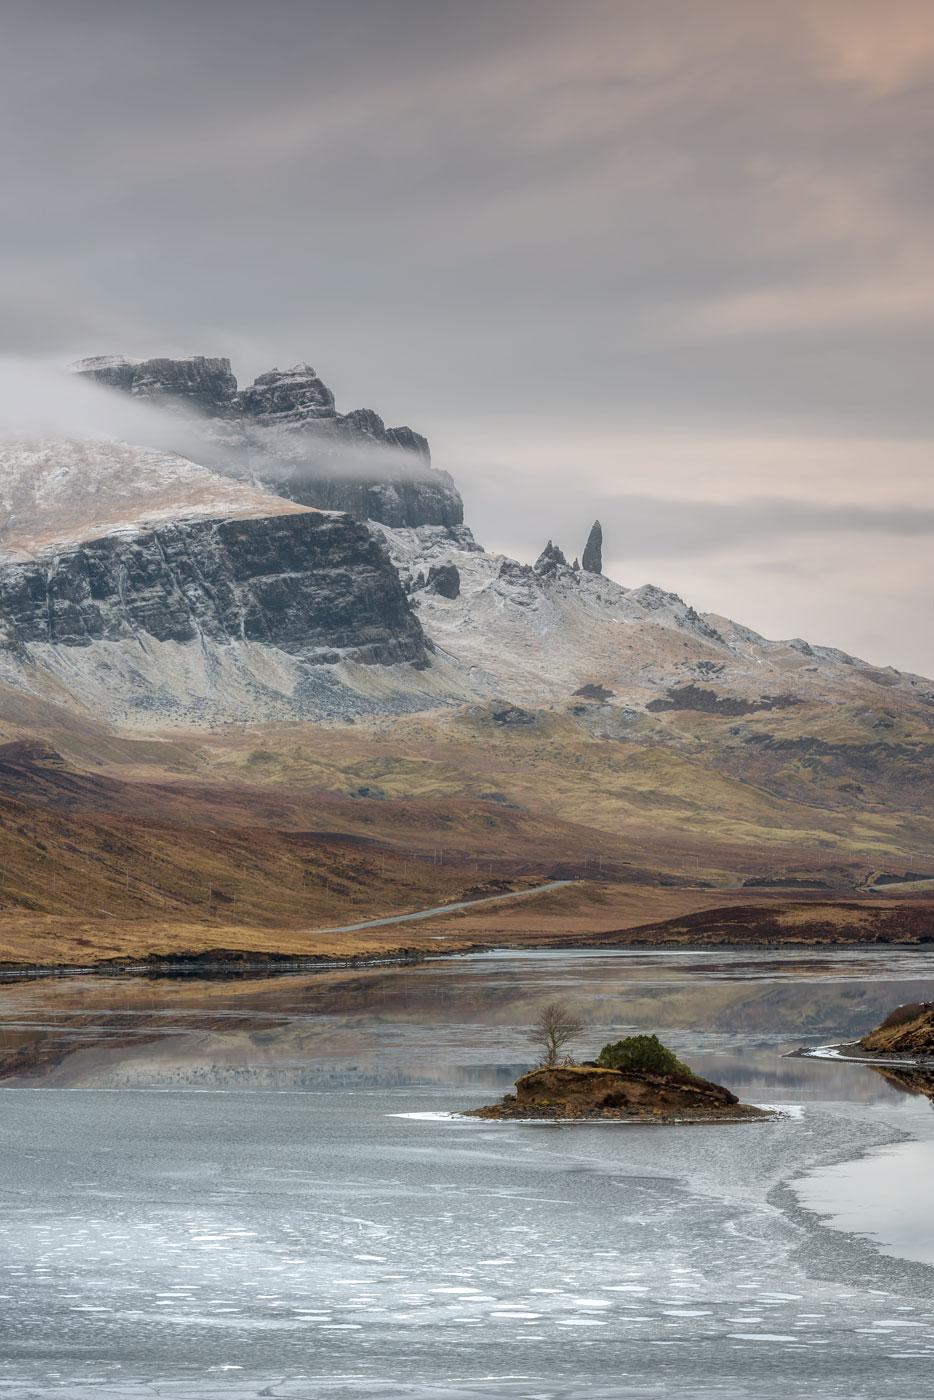 Loch Fada & the Old Man of Storr, Isle of Skye